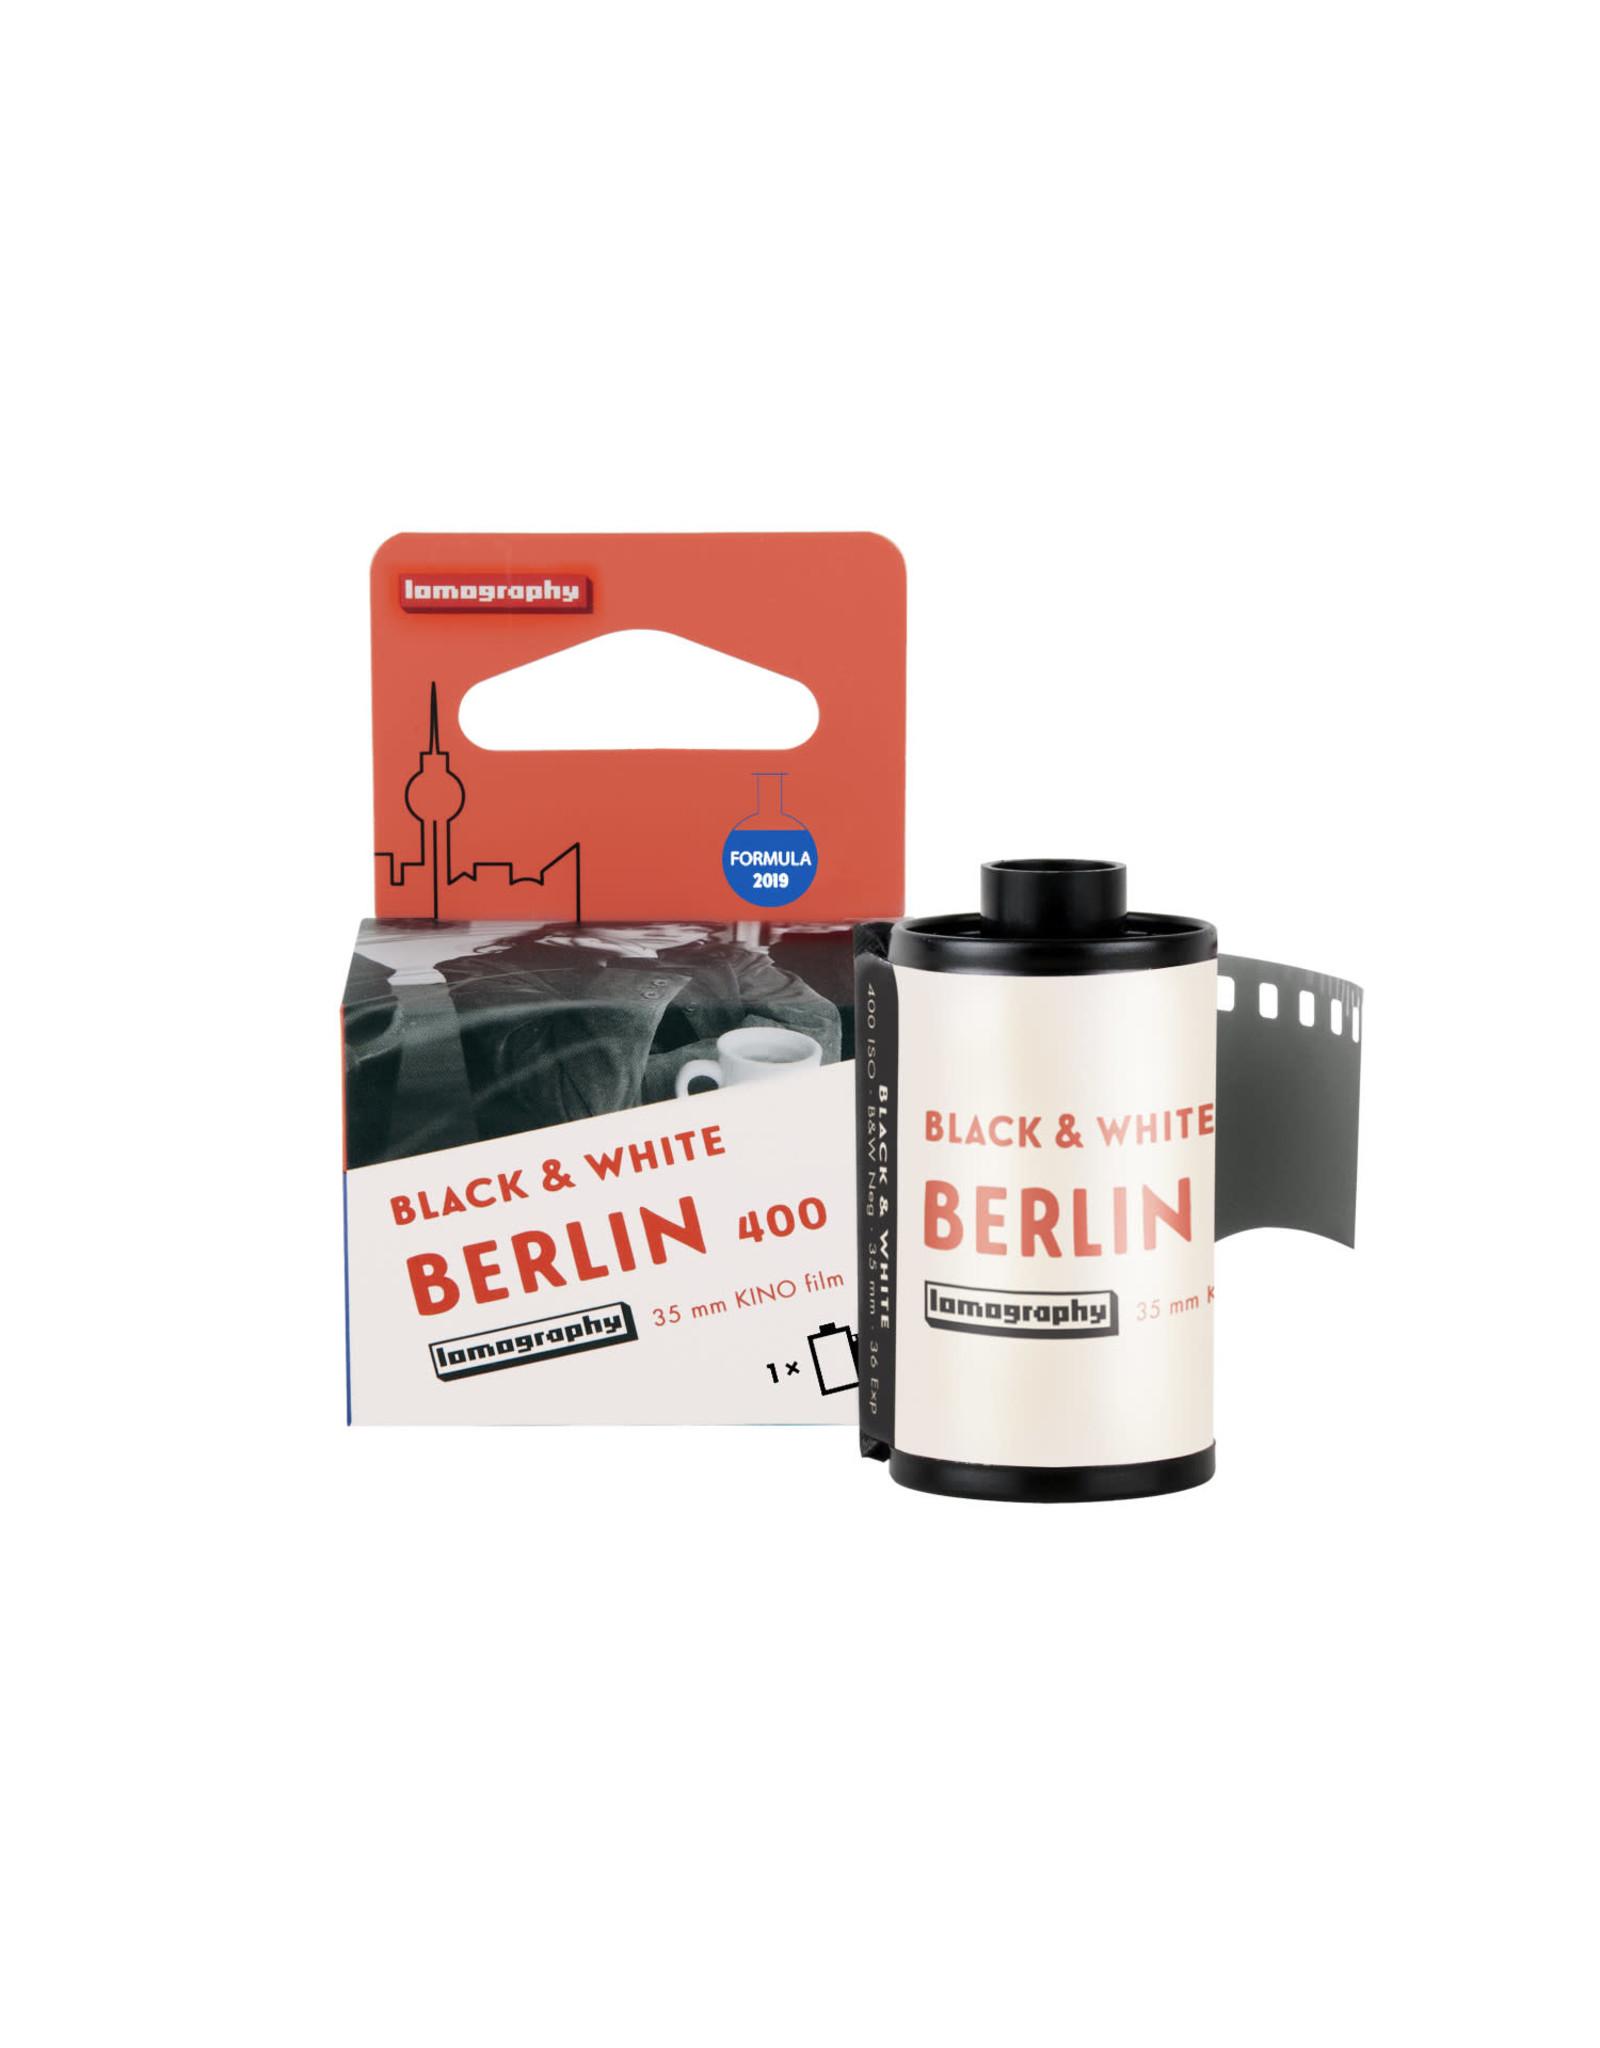 Lomography Lomography B&W 400 35 mm Berlin Kino Film